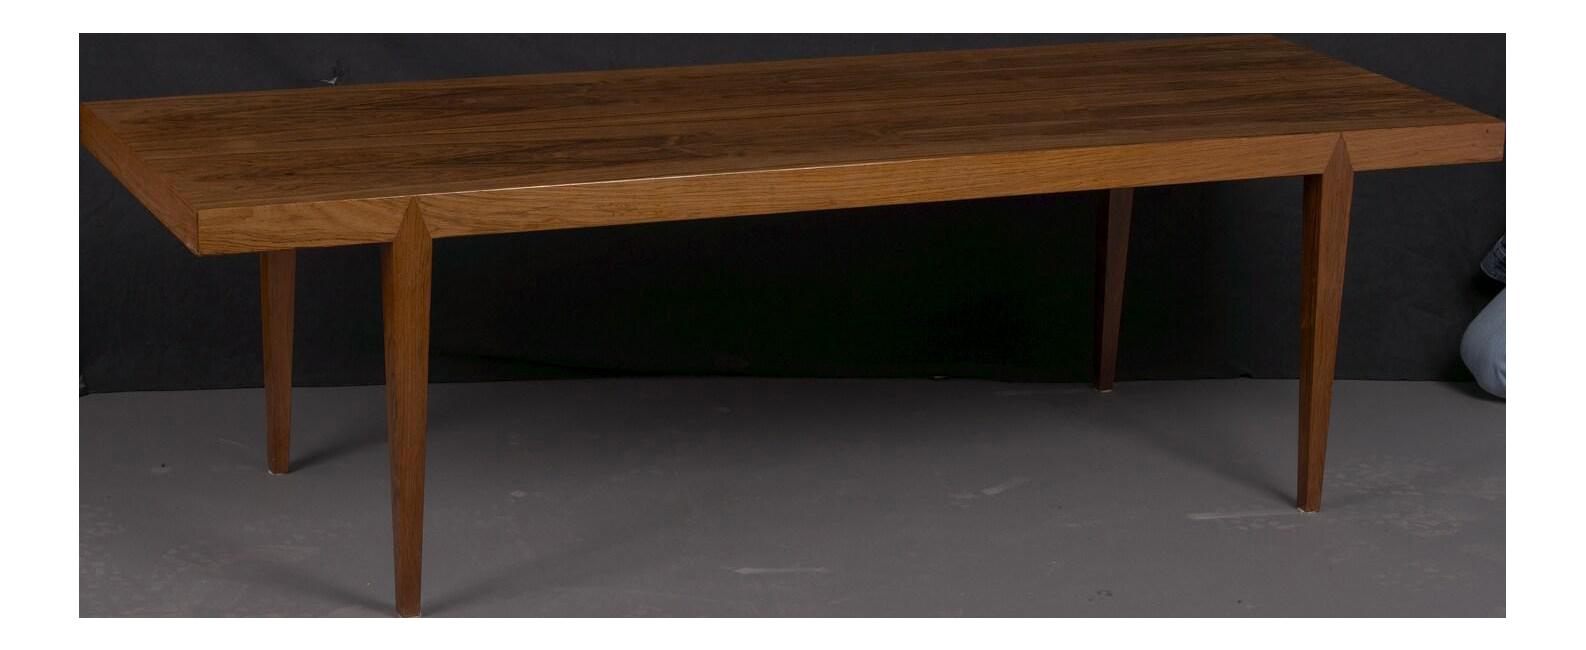 Mid Century Danish Rosewood Coffee Table By Severin Hansen, 1960 | Chairish